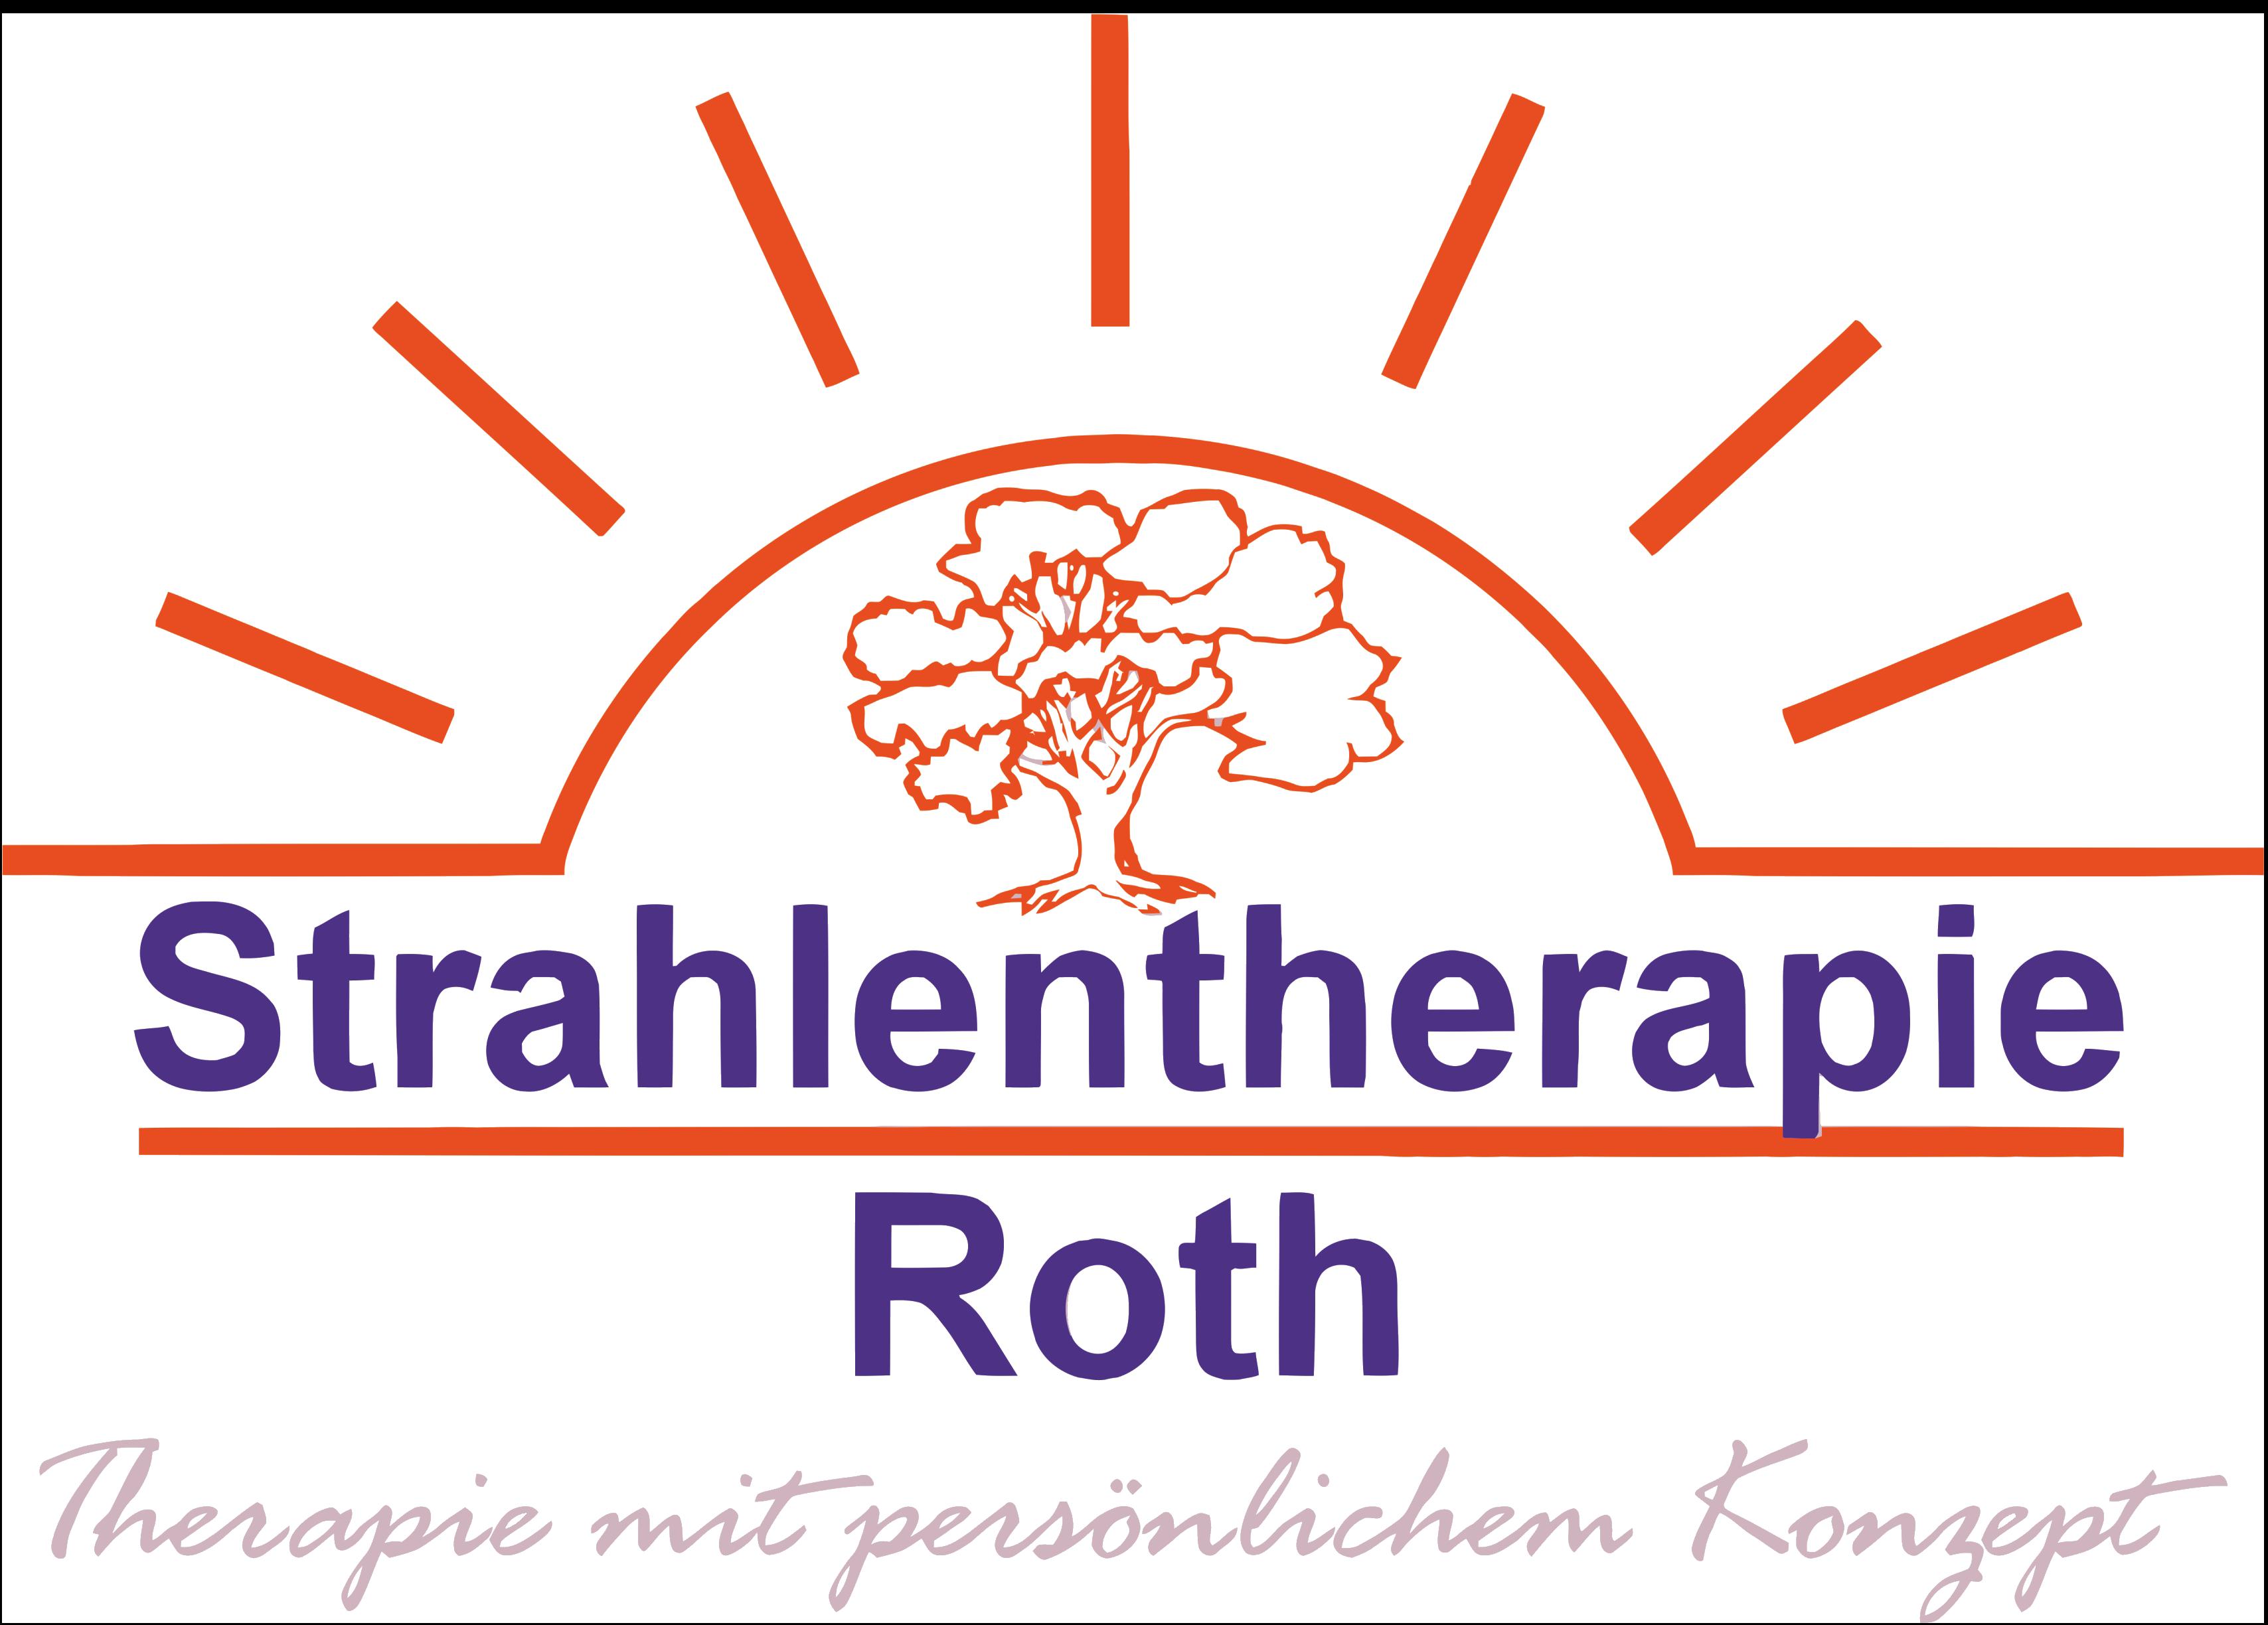 Strahlentherapie-Roth.de